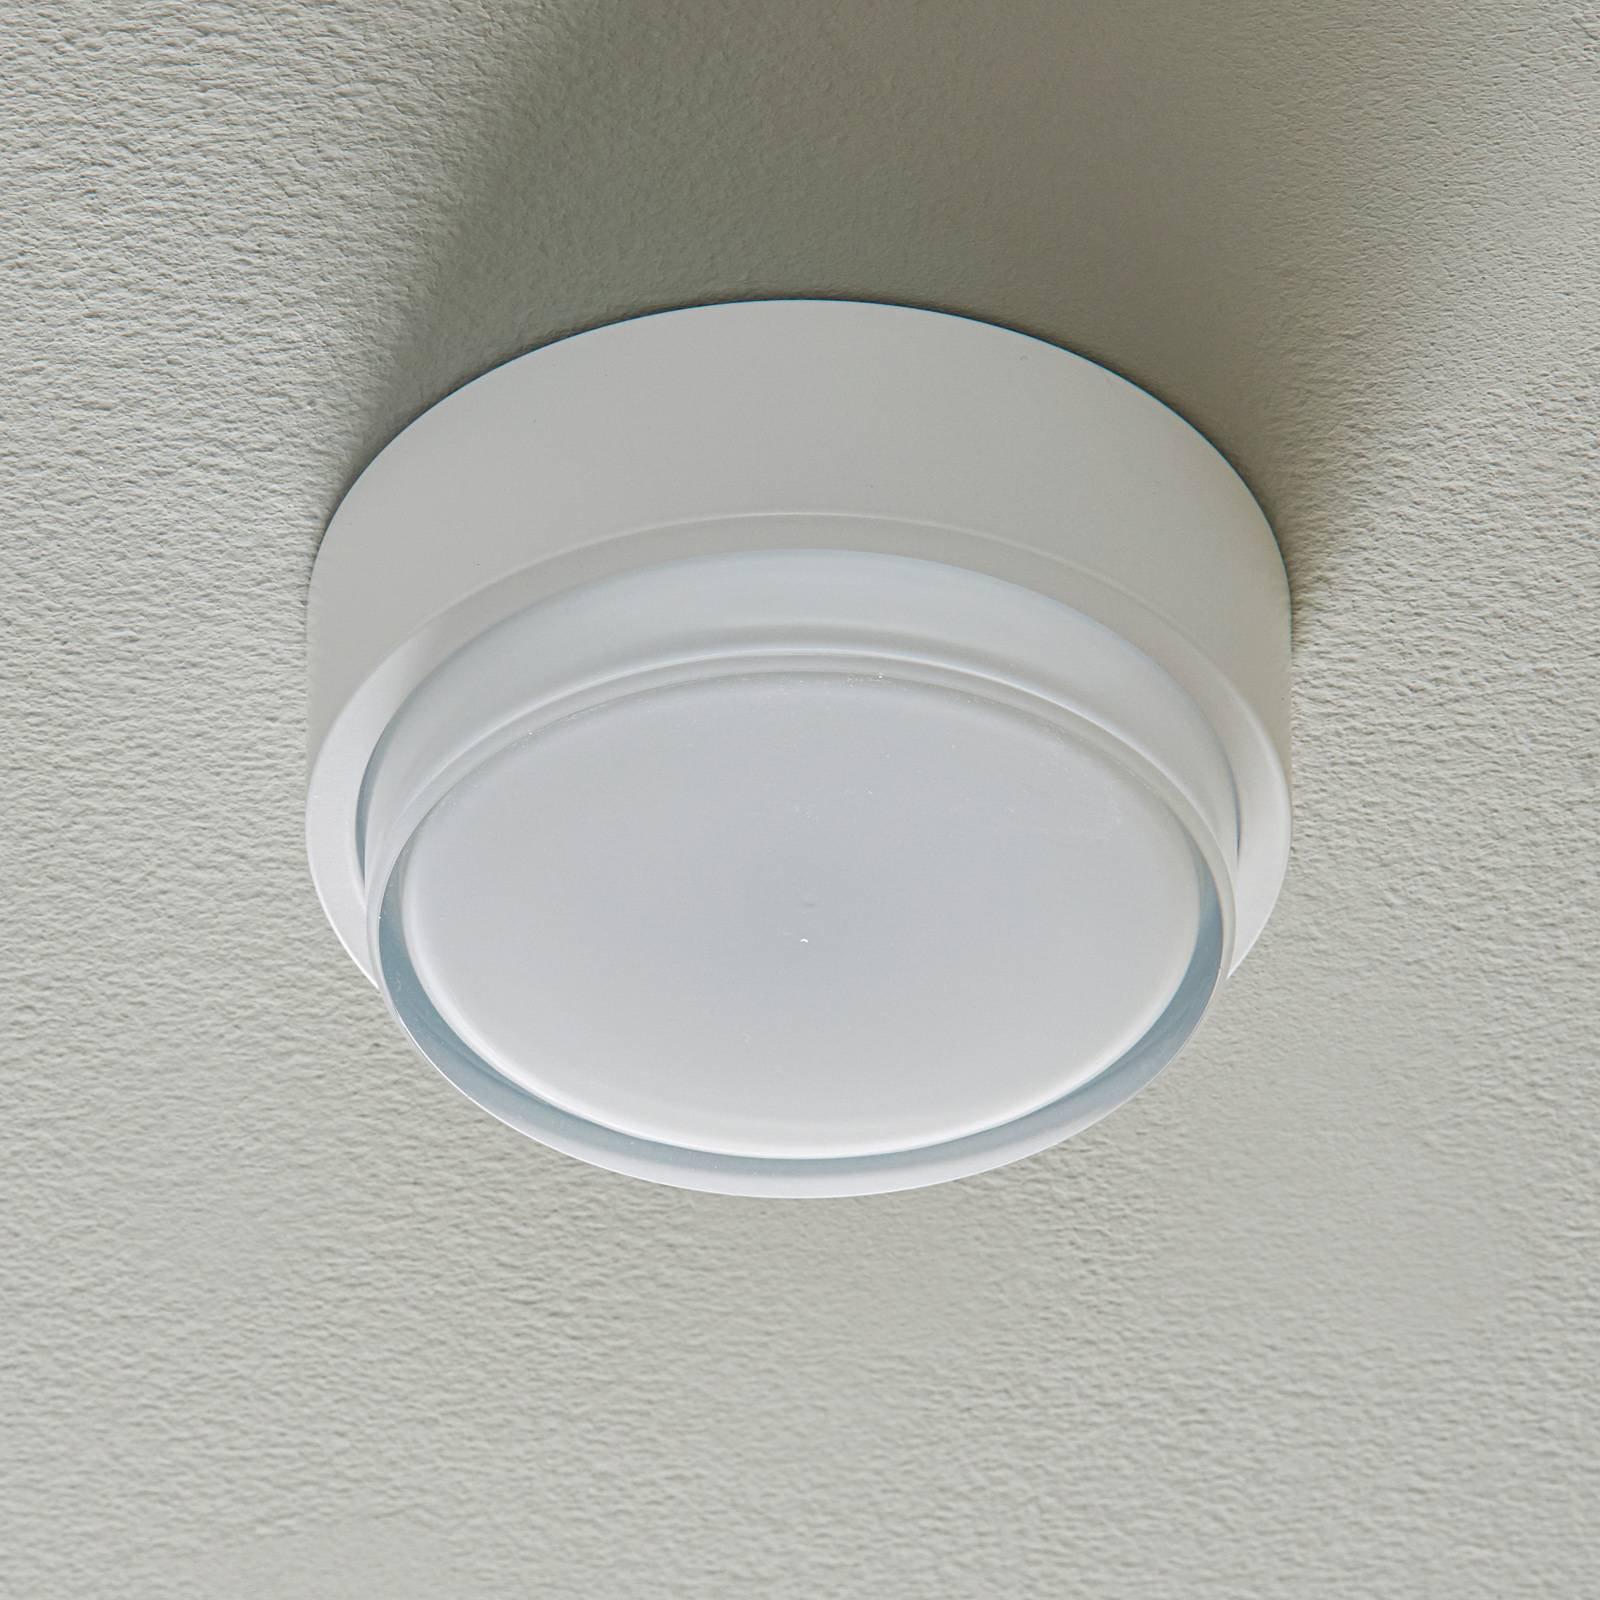 BEGA 50535 LED-taklampe 930 hvit Ø15,5cm